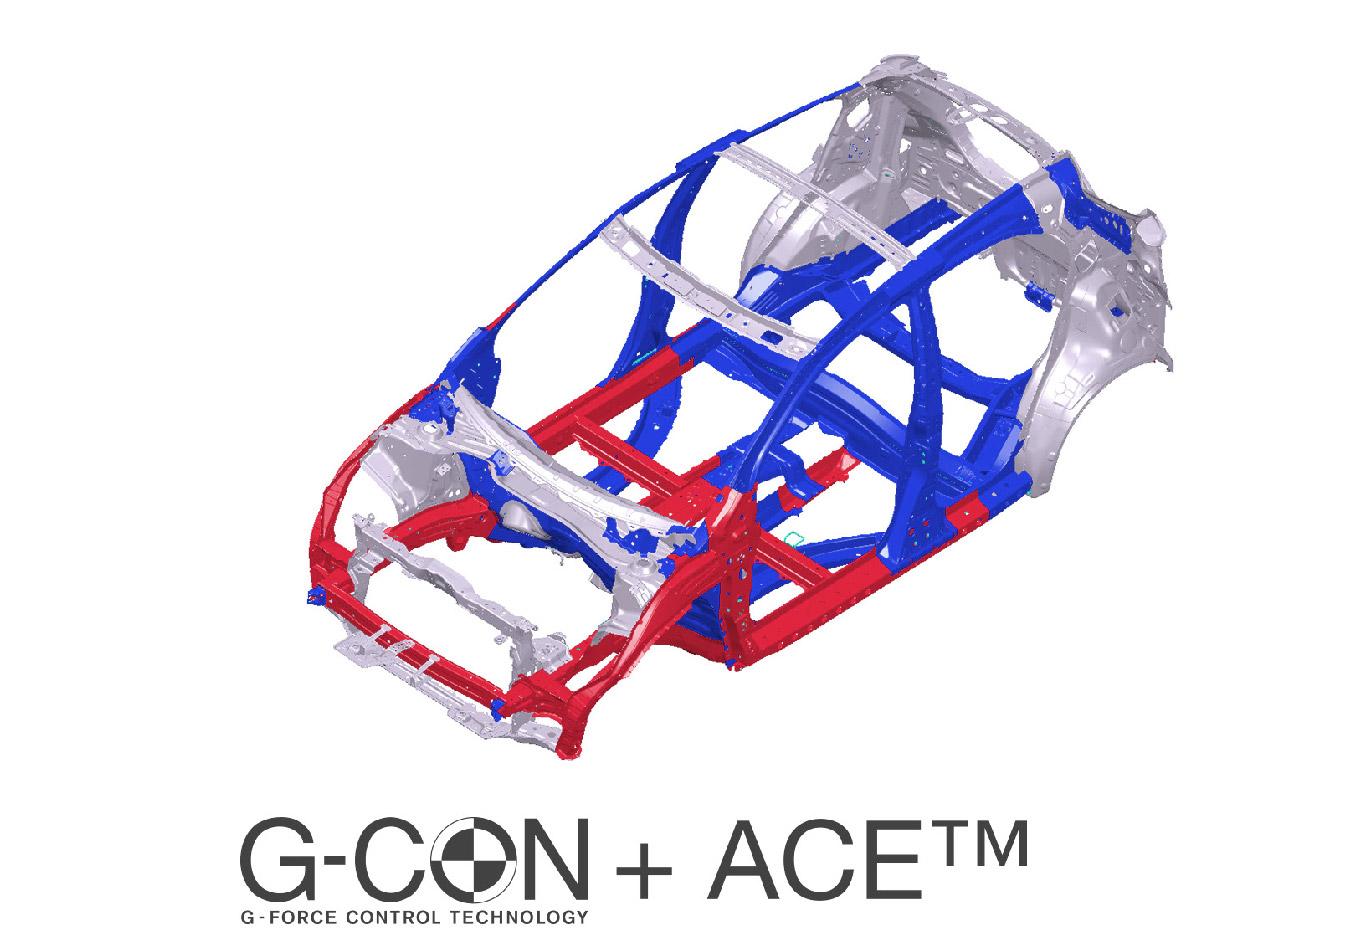 G-CON-ACE™